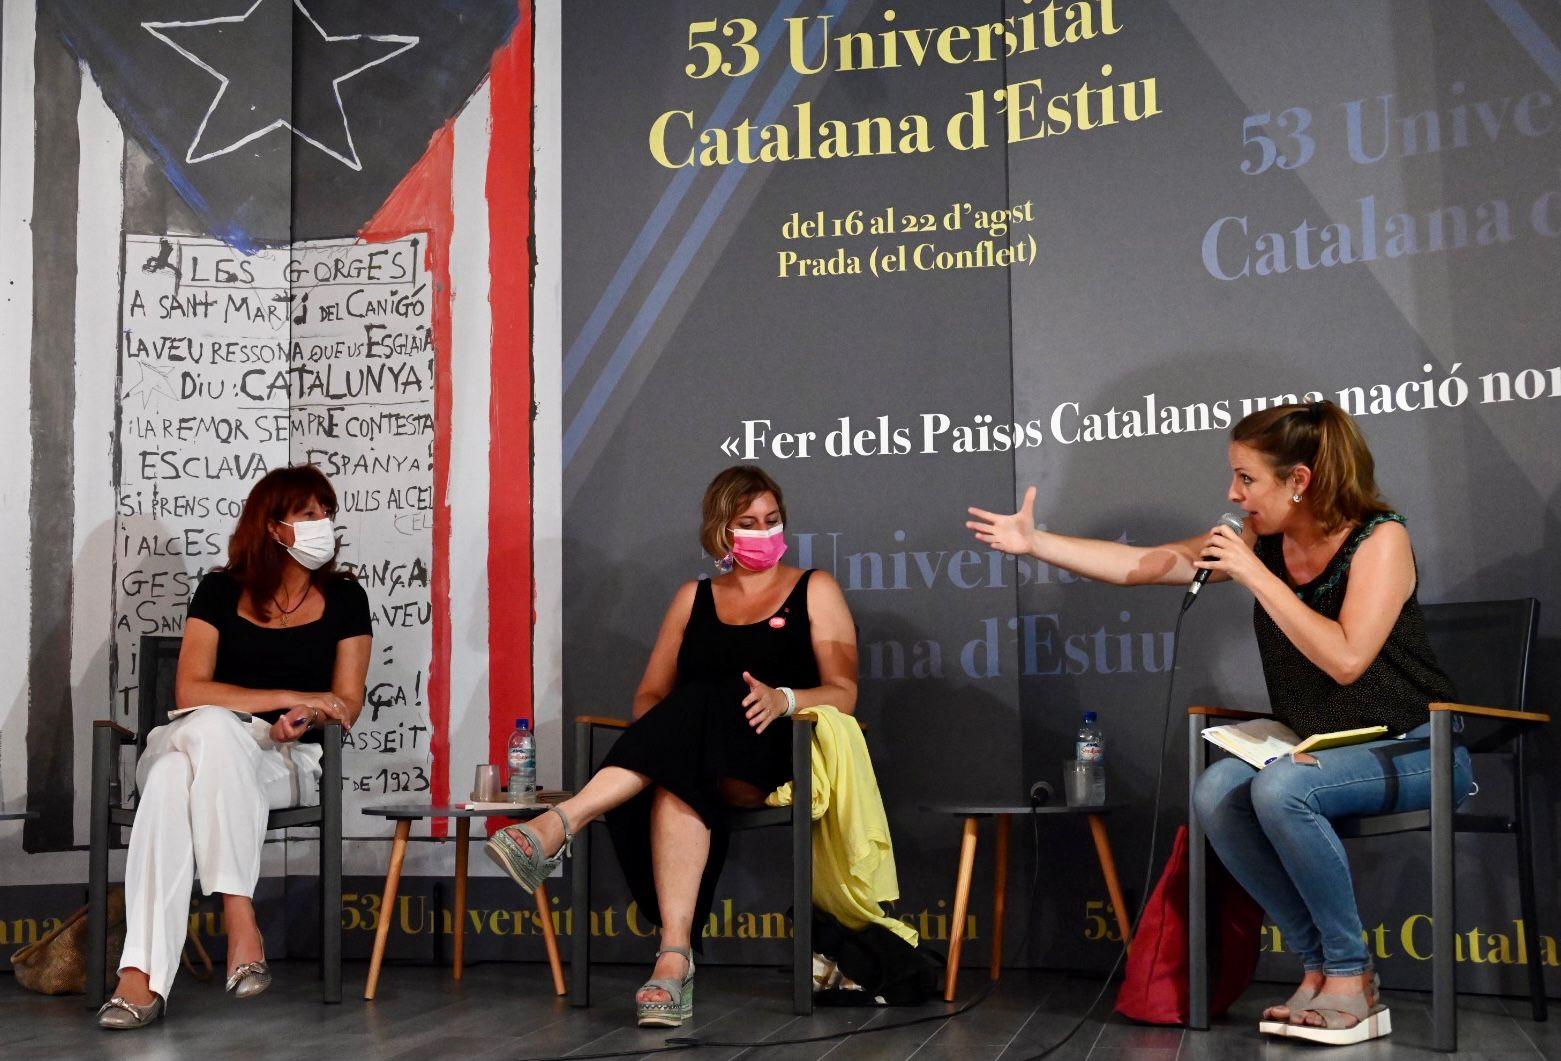 Marta Madrenas, Alba Vergès i Mireia Vehí, al debat de la UCE/Josep Maria Montaner